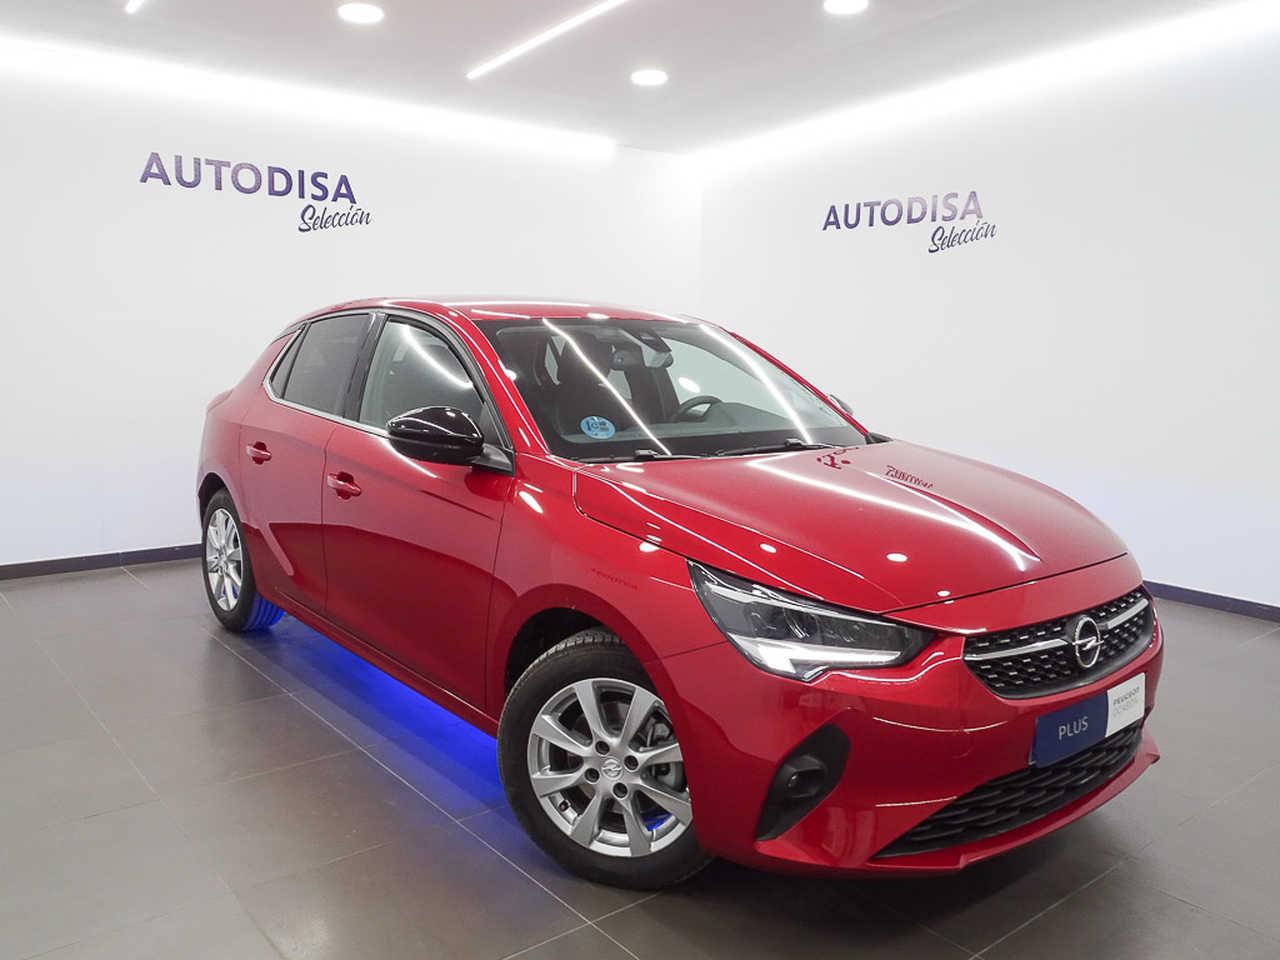 Opel Corsa 1.2T XHL MT6 S/S 100CV 74KW